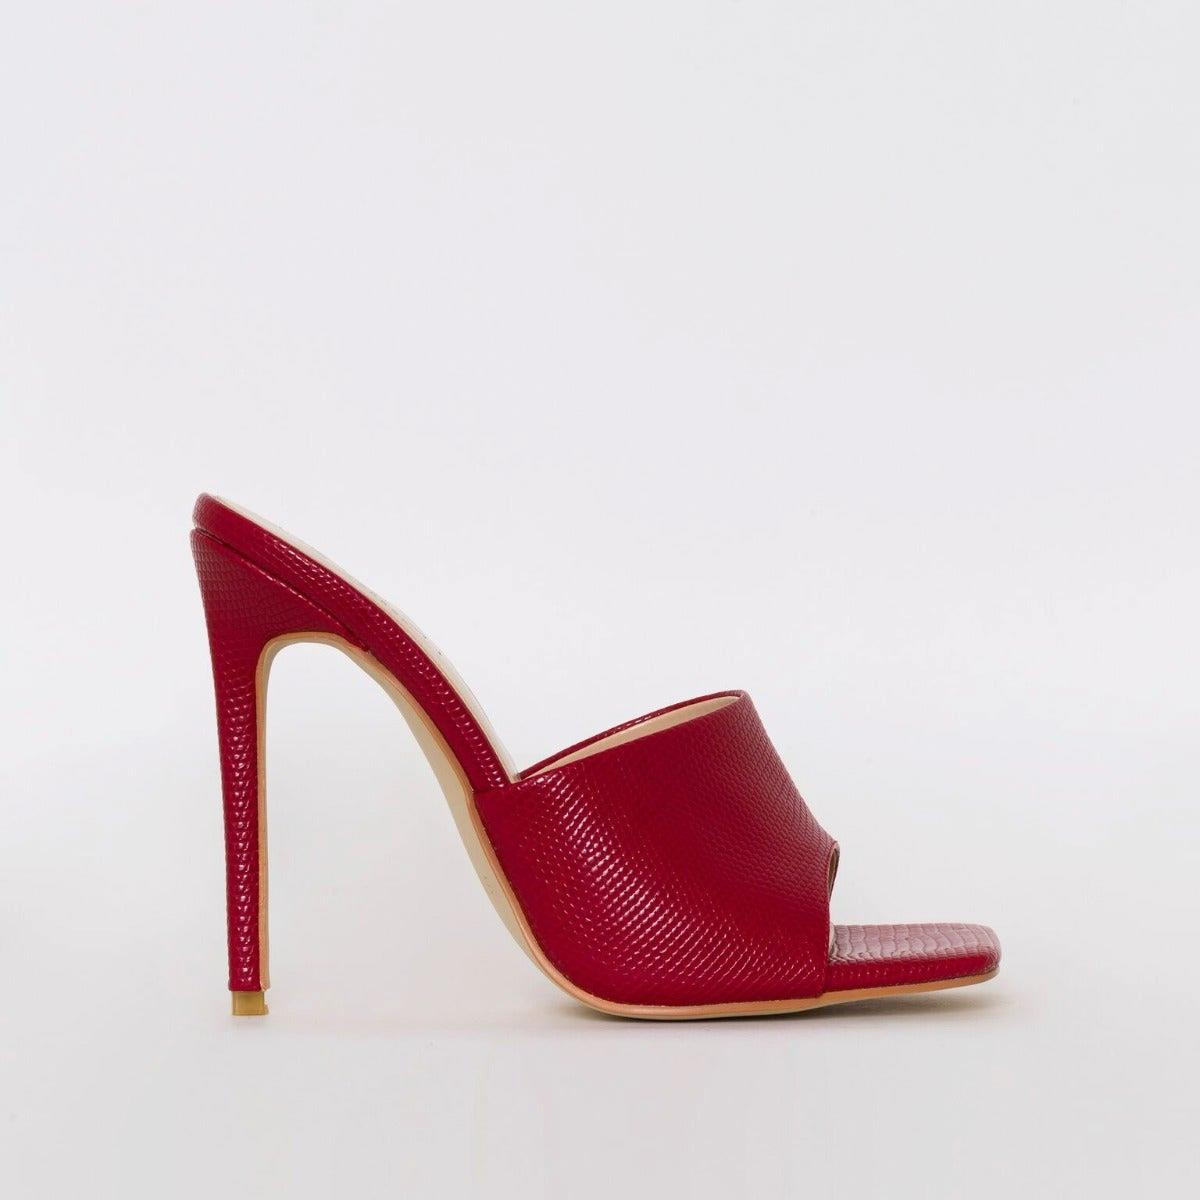 Amalie Red Snake Print Stiletto Mule Heels